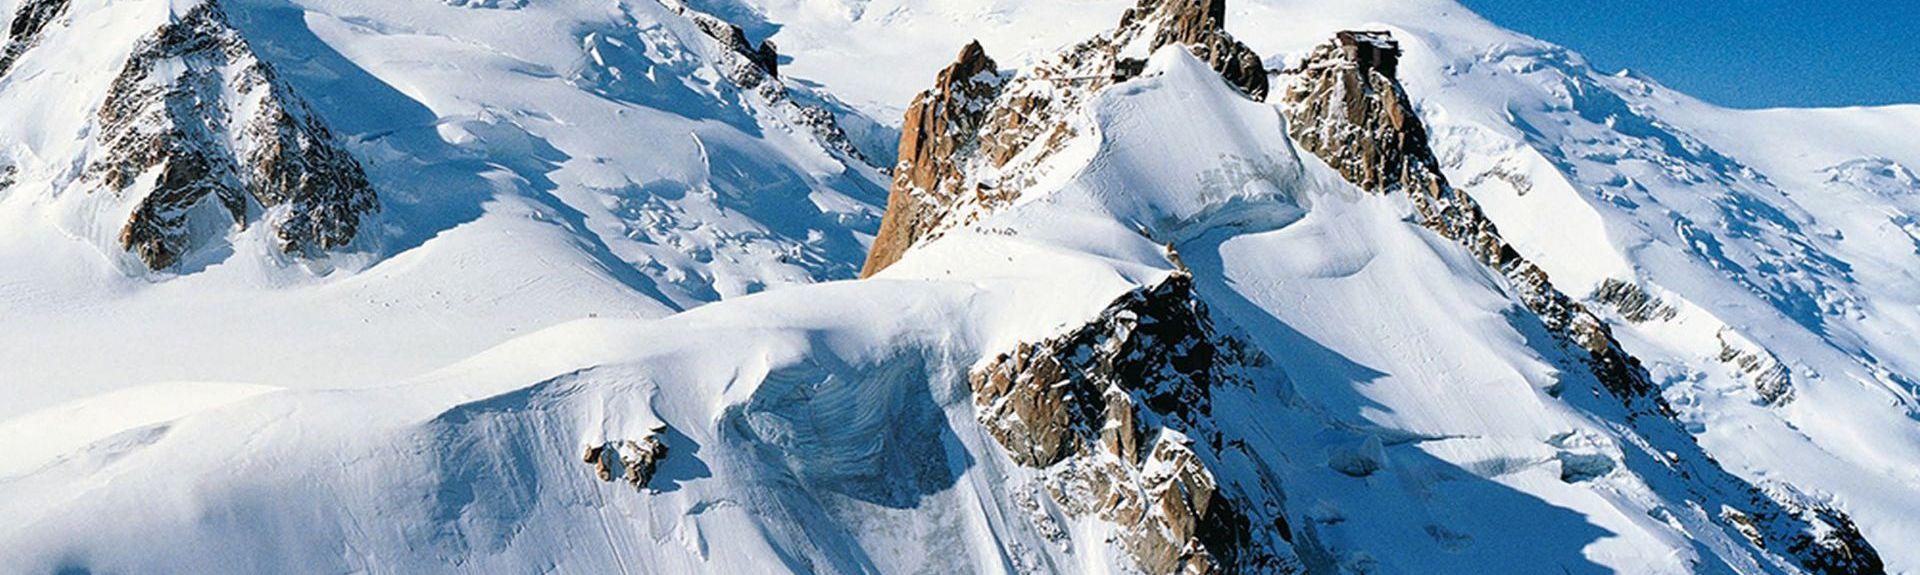 Chamonix-Mont-Blanc Les Tines Station, France